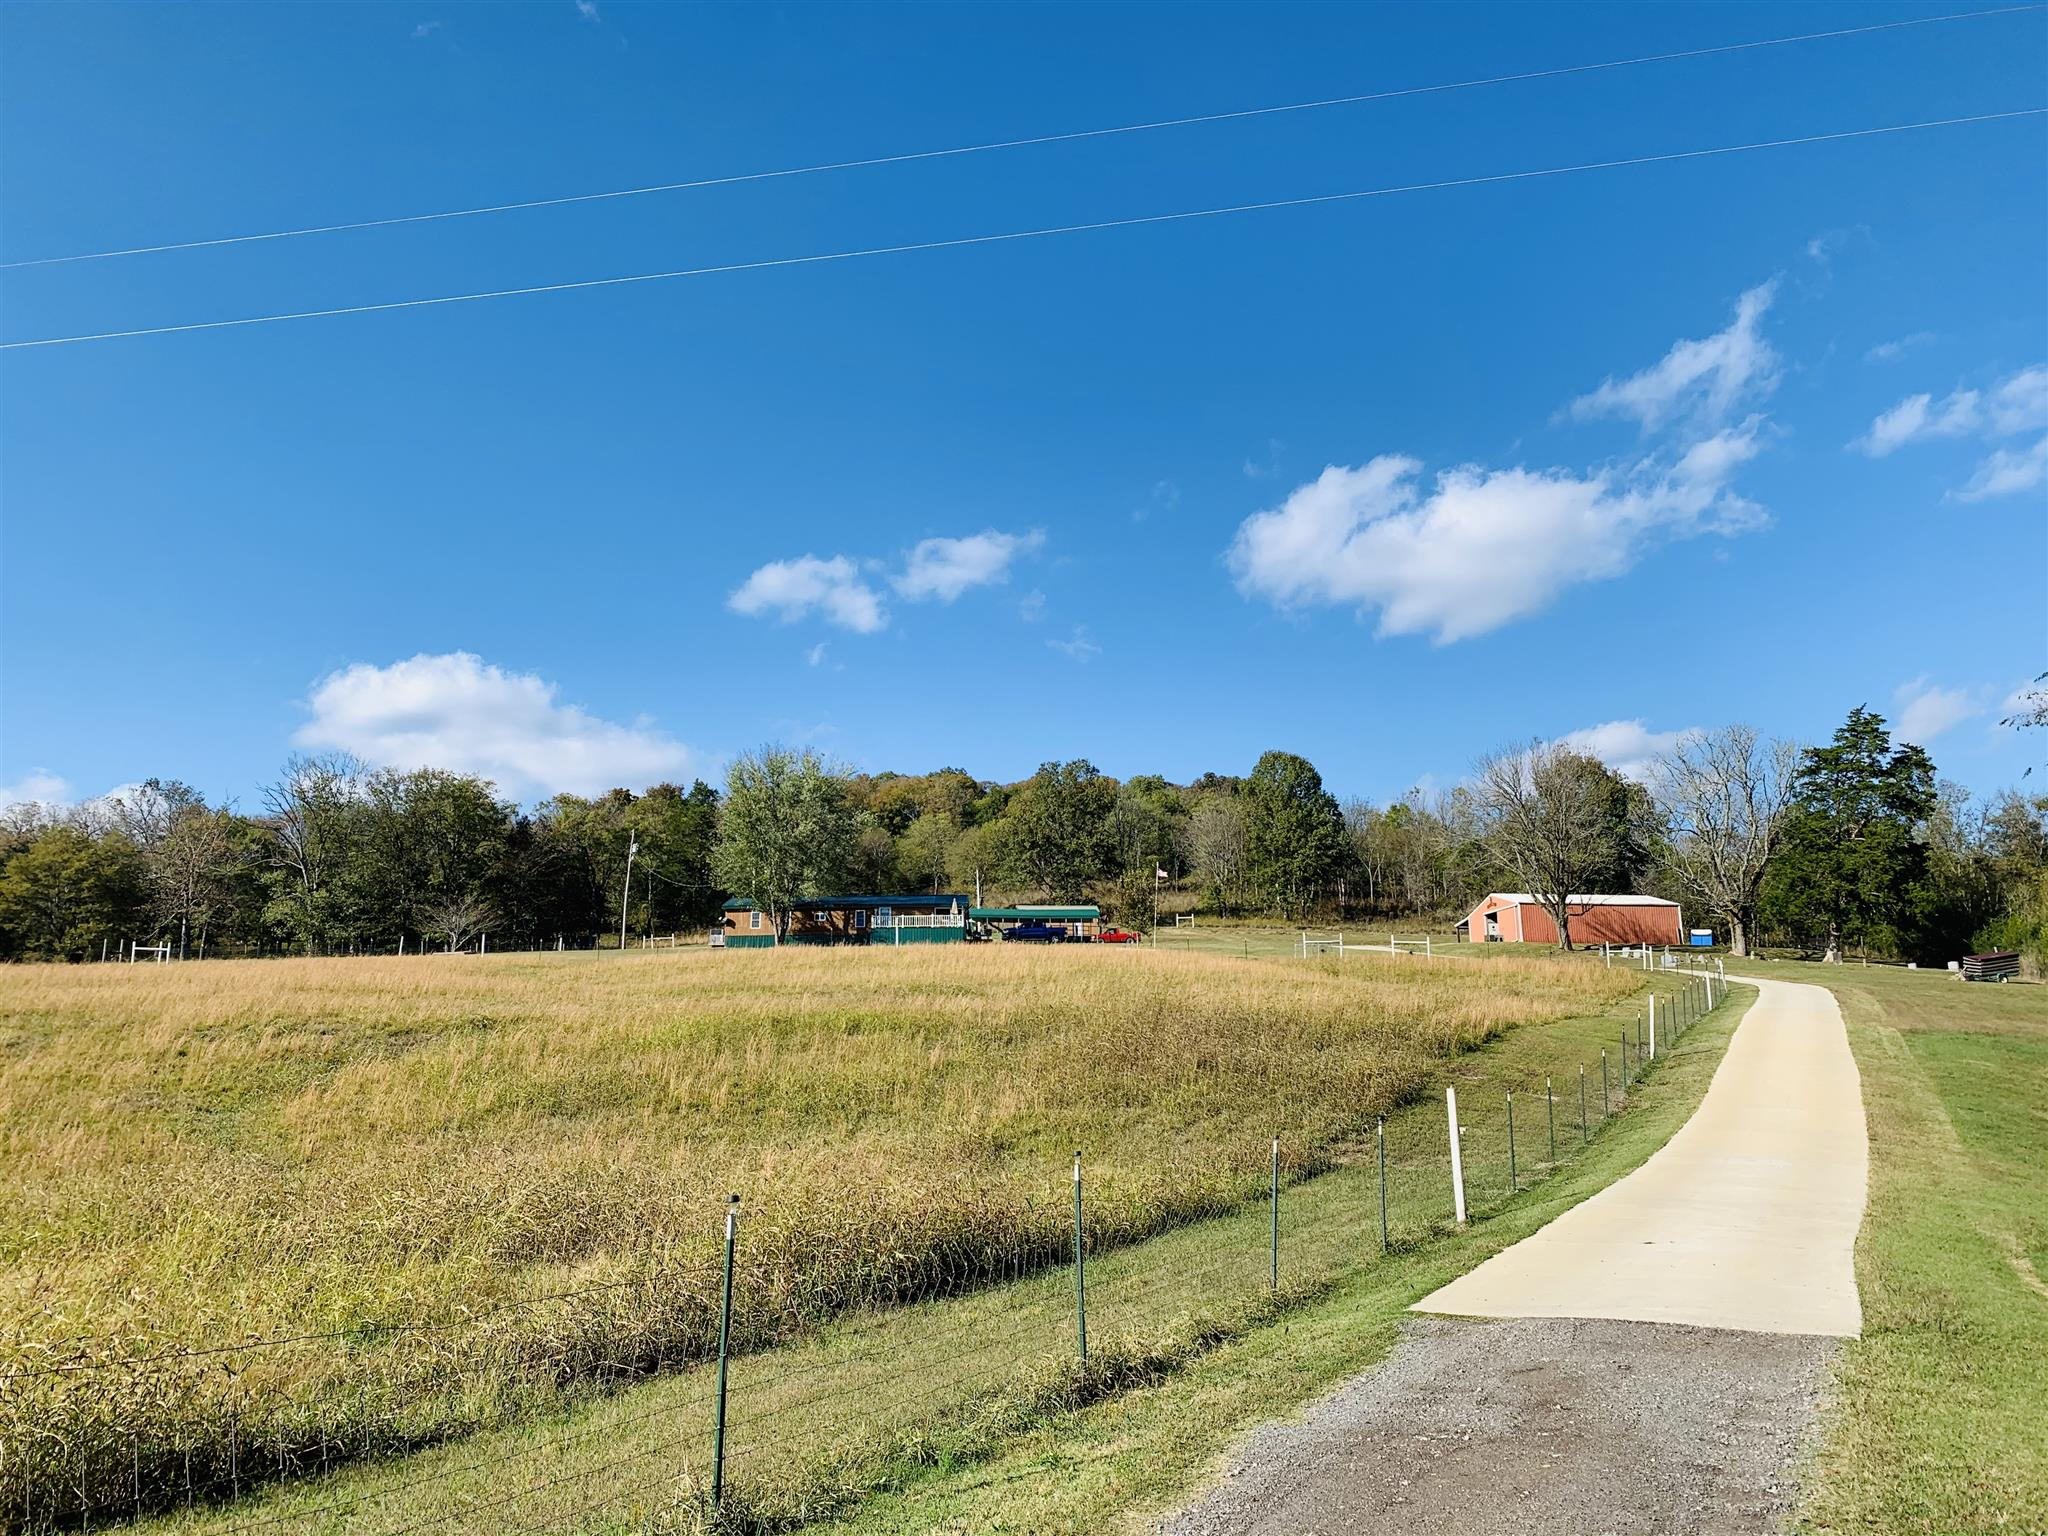 171 Little Salt Lick Rd, Pleasant Shade, TN 37145 - Pleasant Shade, TN real estate listing